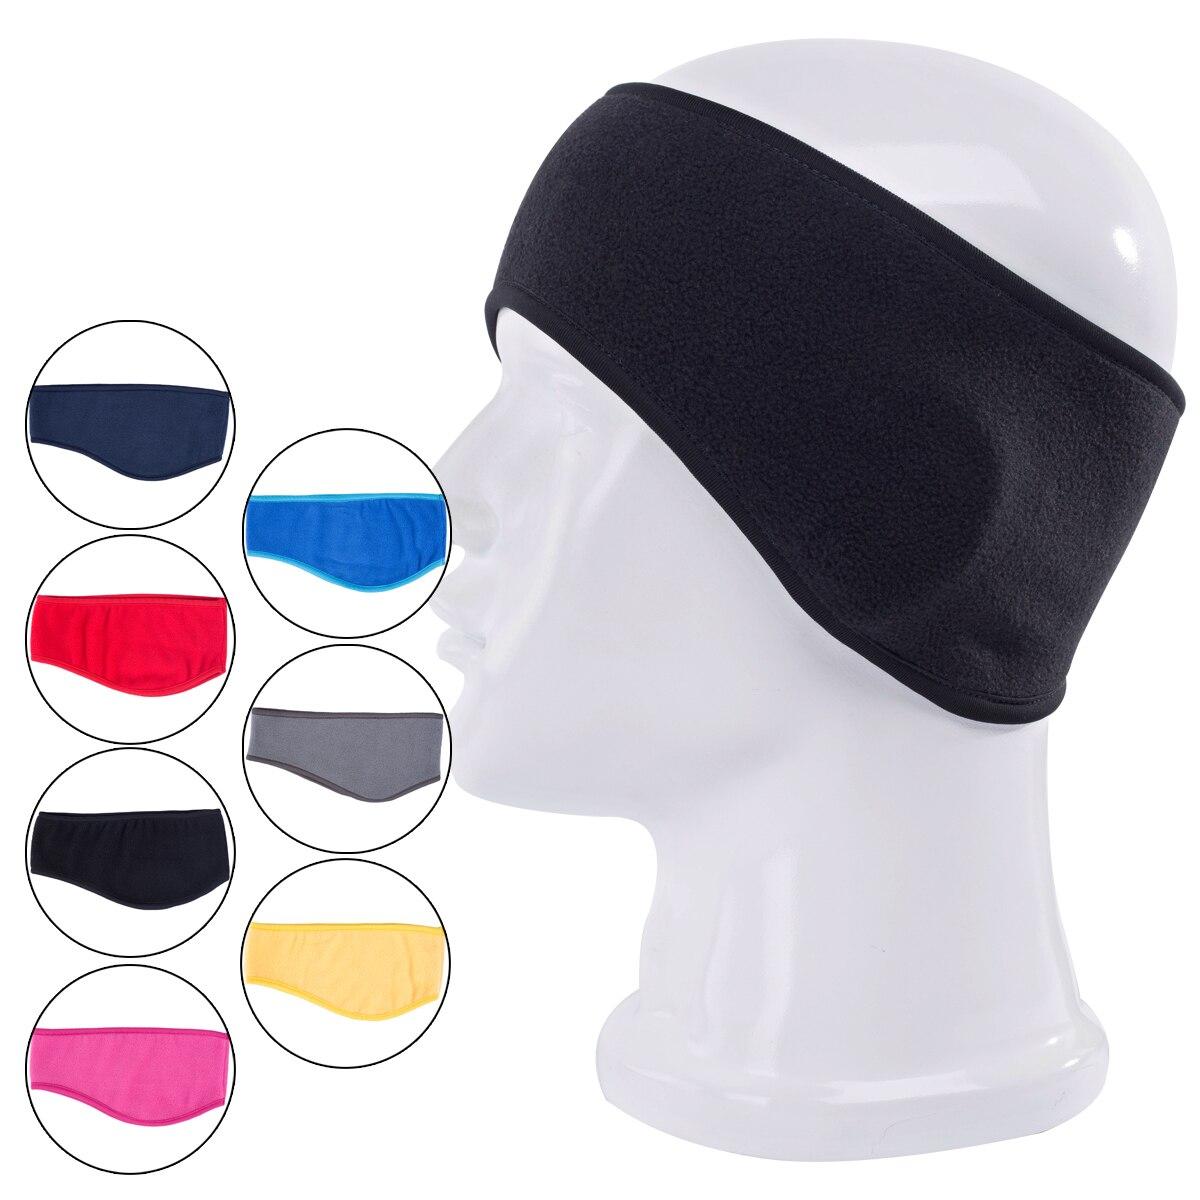 Unisex Women Men Headwear Ear Warm Winter Head Band Polar Fleece Ear Muff Stretch Spandex Hair Band Accessories